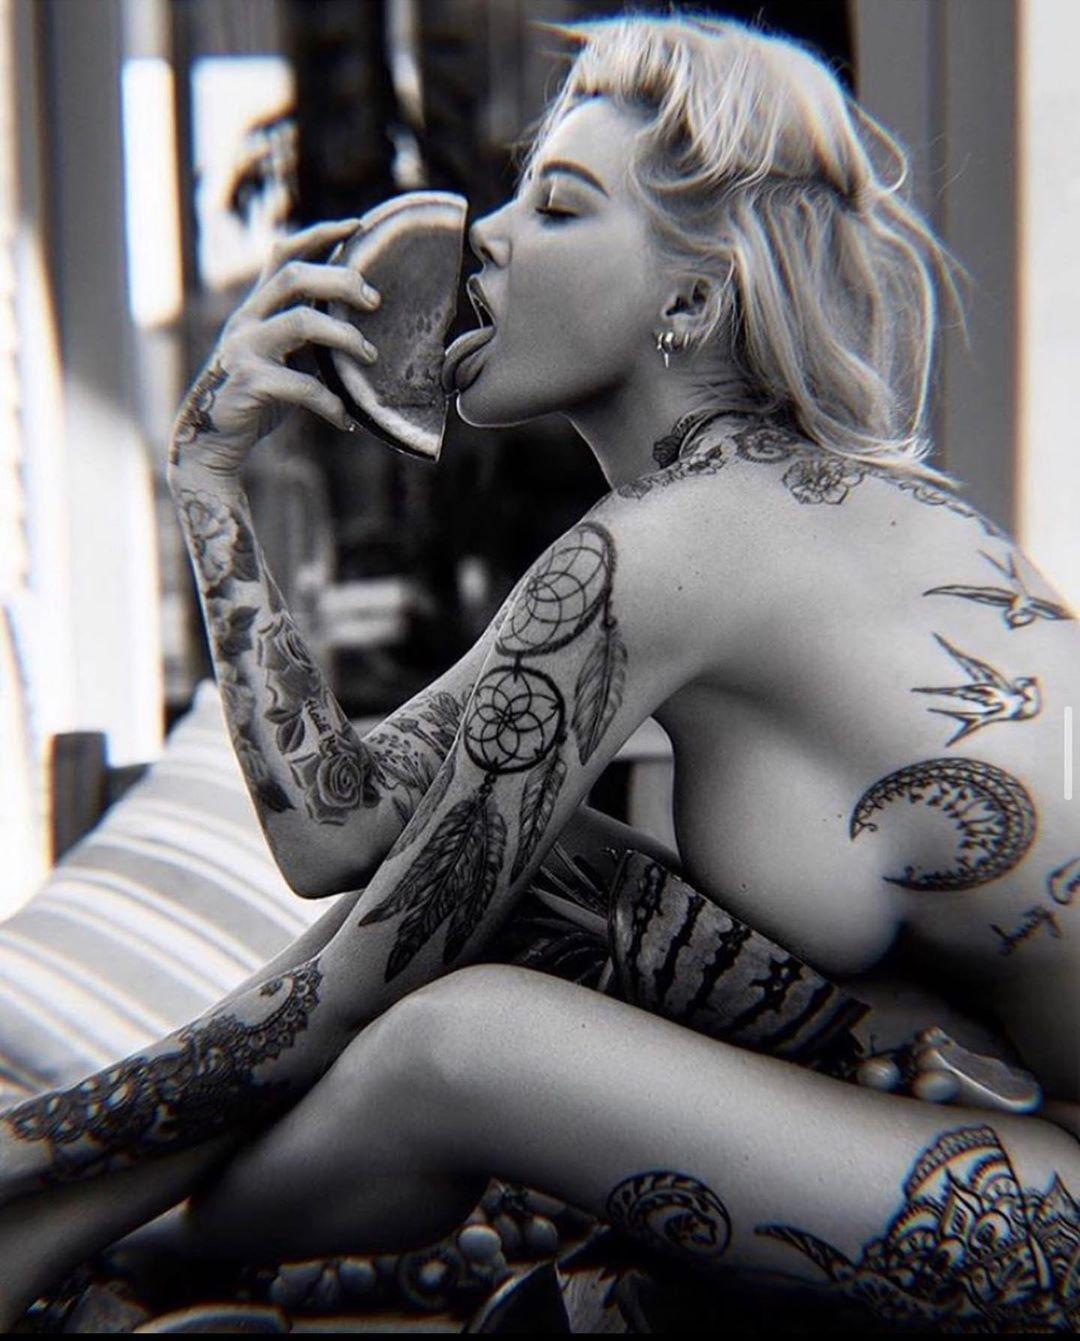 #worldfamousink #neotraditionaltattoo #skinart #ink #fullcolortattoo #tattoo #tattoos #tattoostyle #tattooculture #tattoosociety #tattoolifestyle #tattolife  #Tattooing #tattooink #tattoo #inked #inkadicct #tatuaje #BestTattoo #Tattoed #Tattooart #Tattoowork #tattoorealistic #tattoodesign #tattoostyle #tattoostyle #tattooing #tattoomodel #tattoo #tattooed #tatuaje #tatuajes #tattoodesign #tattoomania #tattoostyle #tattoostyle #tattooing #tattoomodel #tattoo #tattooed #tatuaje #tatuajes #tattoode